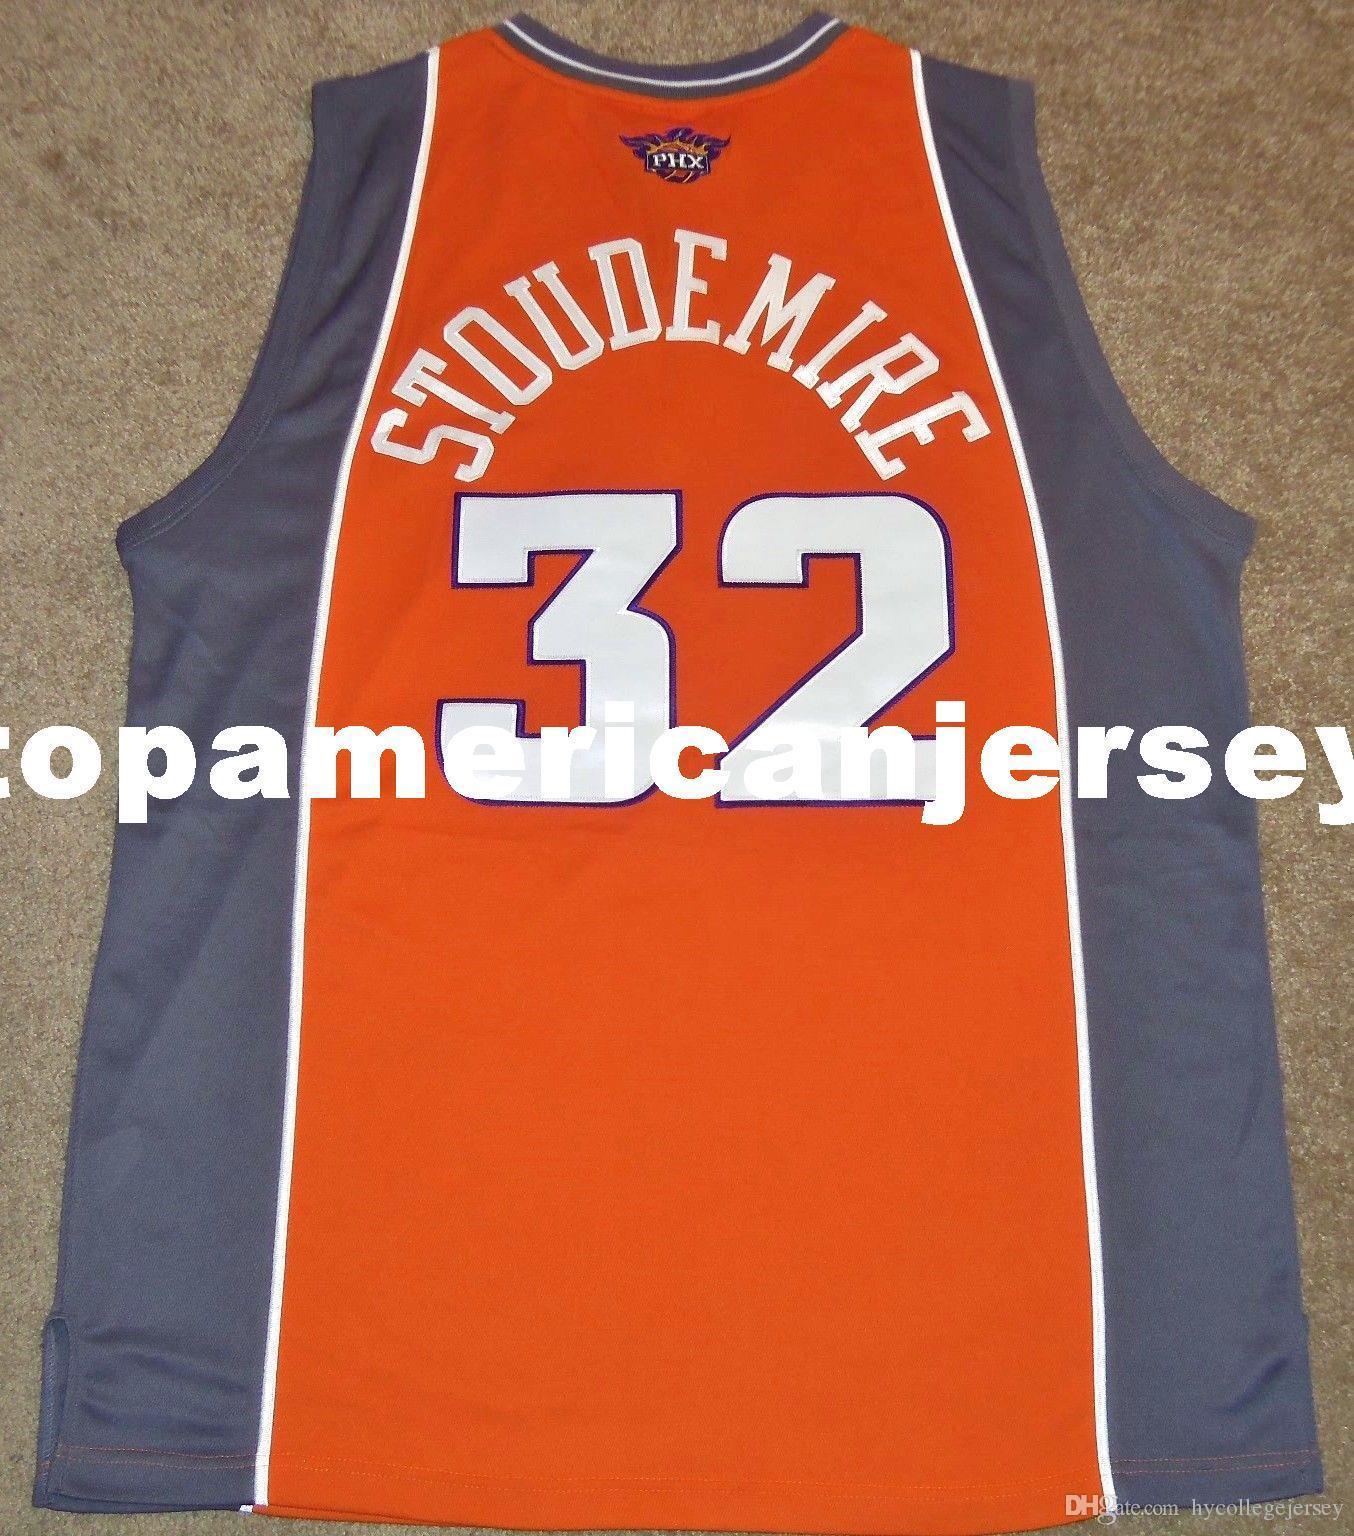 New Top Amar'e Stoudemire # 32 de alta qualidade Rbk ALT 3RD JERSEY SEWN! basquete Vest Mens Tamanho XS-6XL costurado Jerseys Ncaa